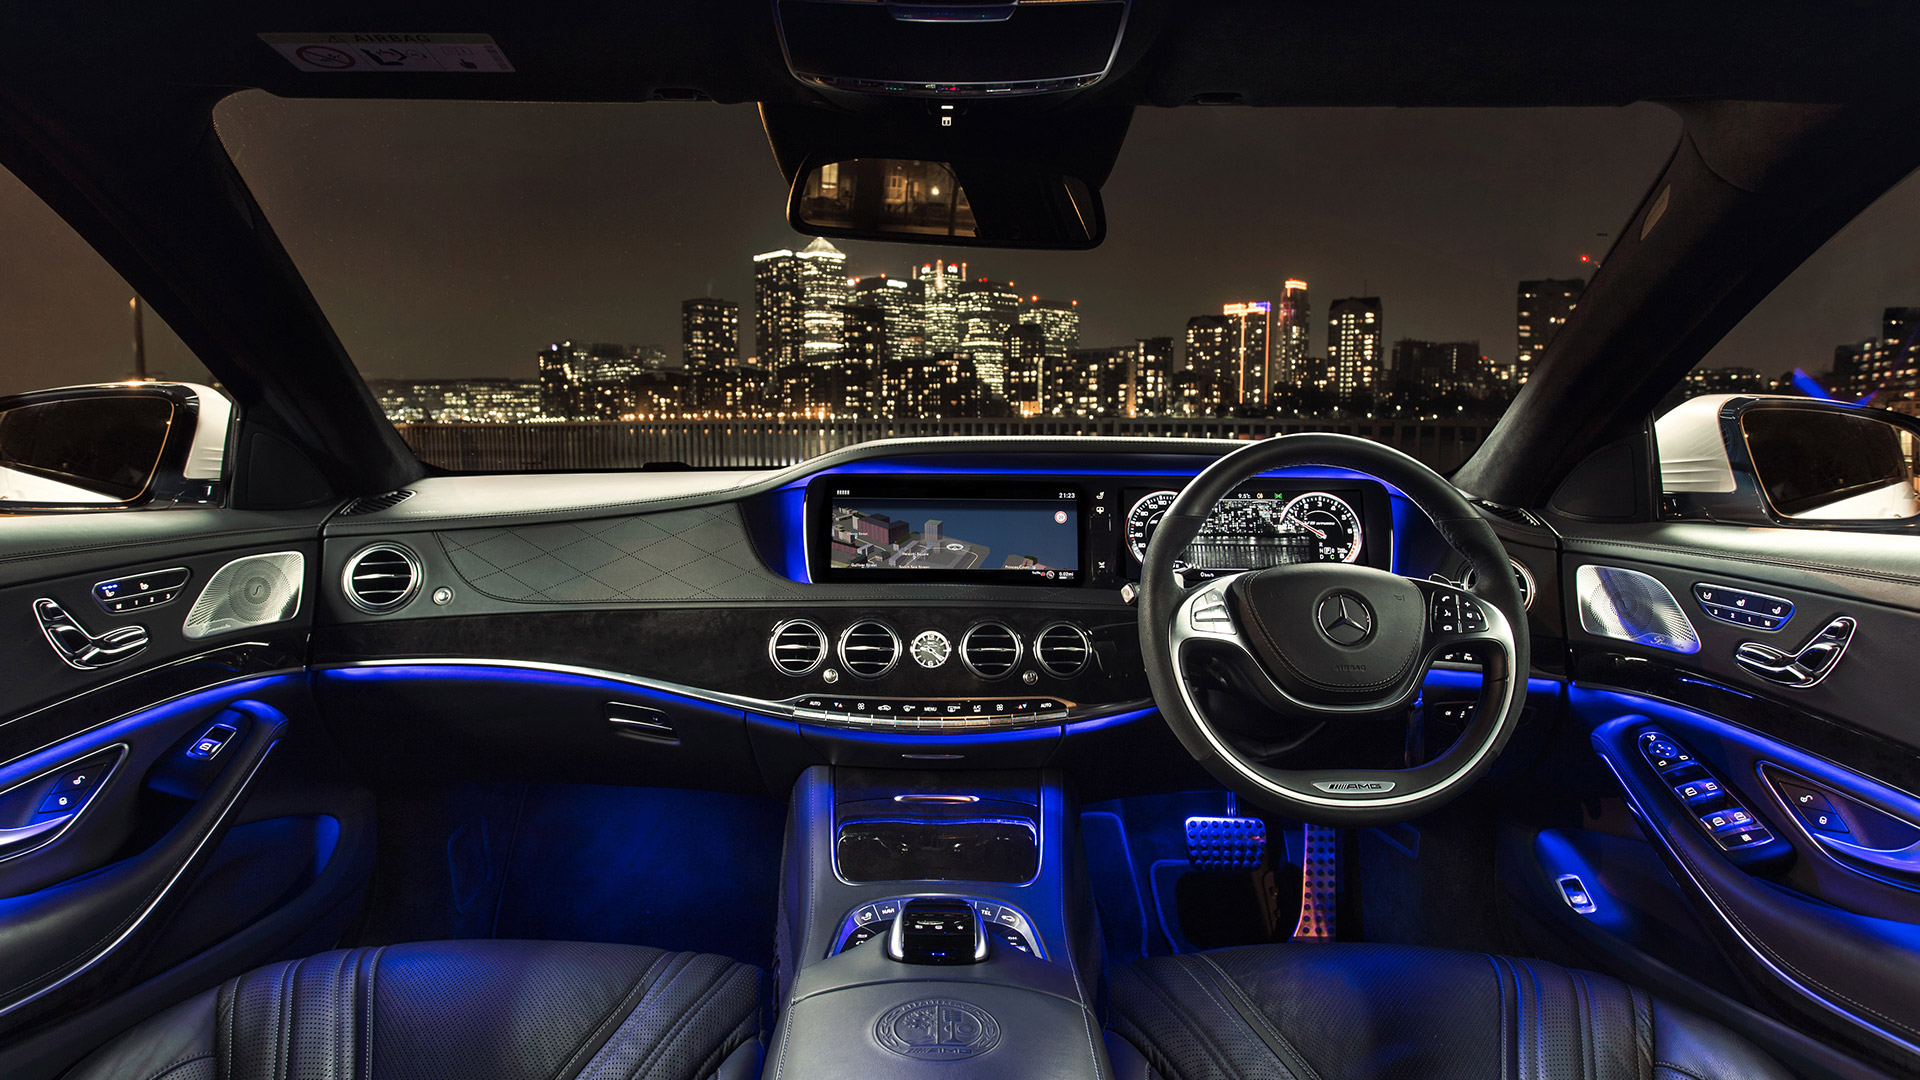 Mercedes benz s class 2016 s400 price mileage reviews for Mercedes benz s400 price